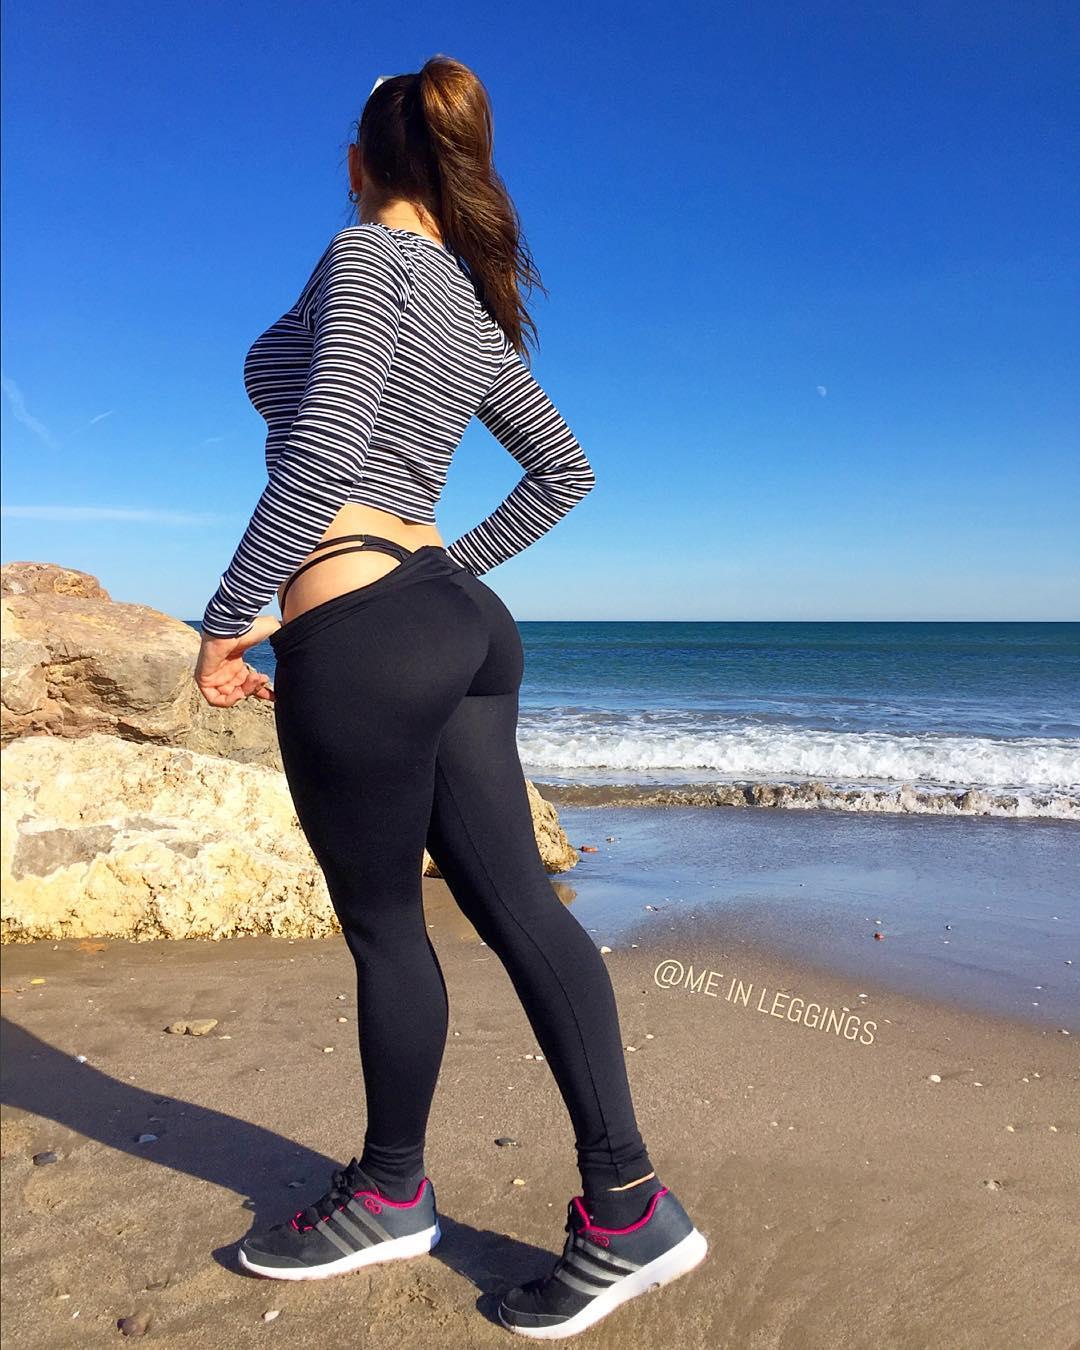 Big butt virginia brazilian mom ass pic